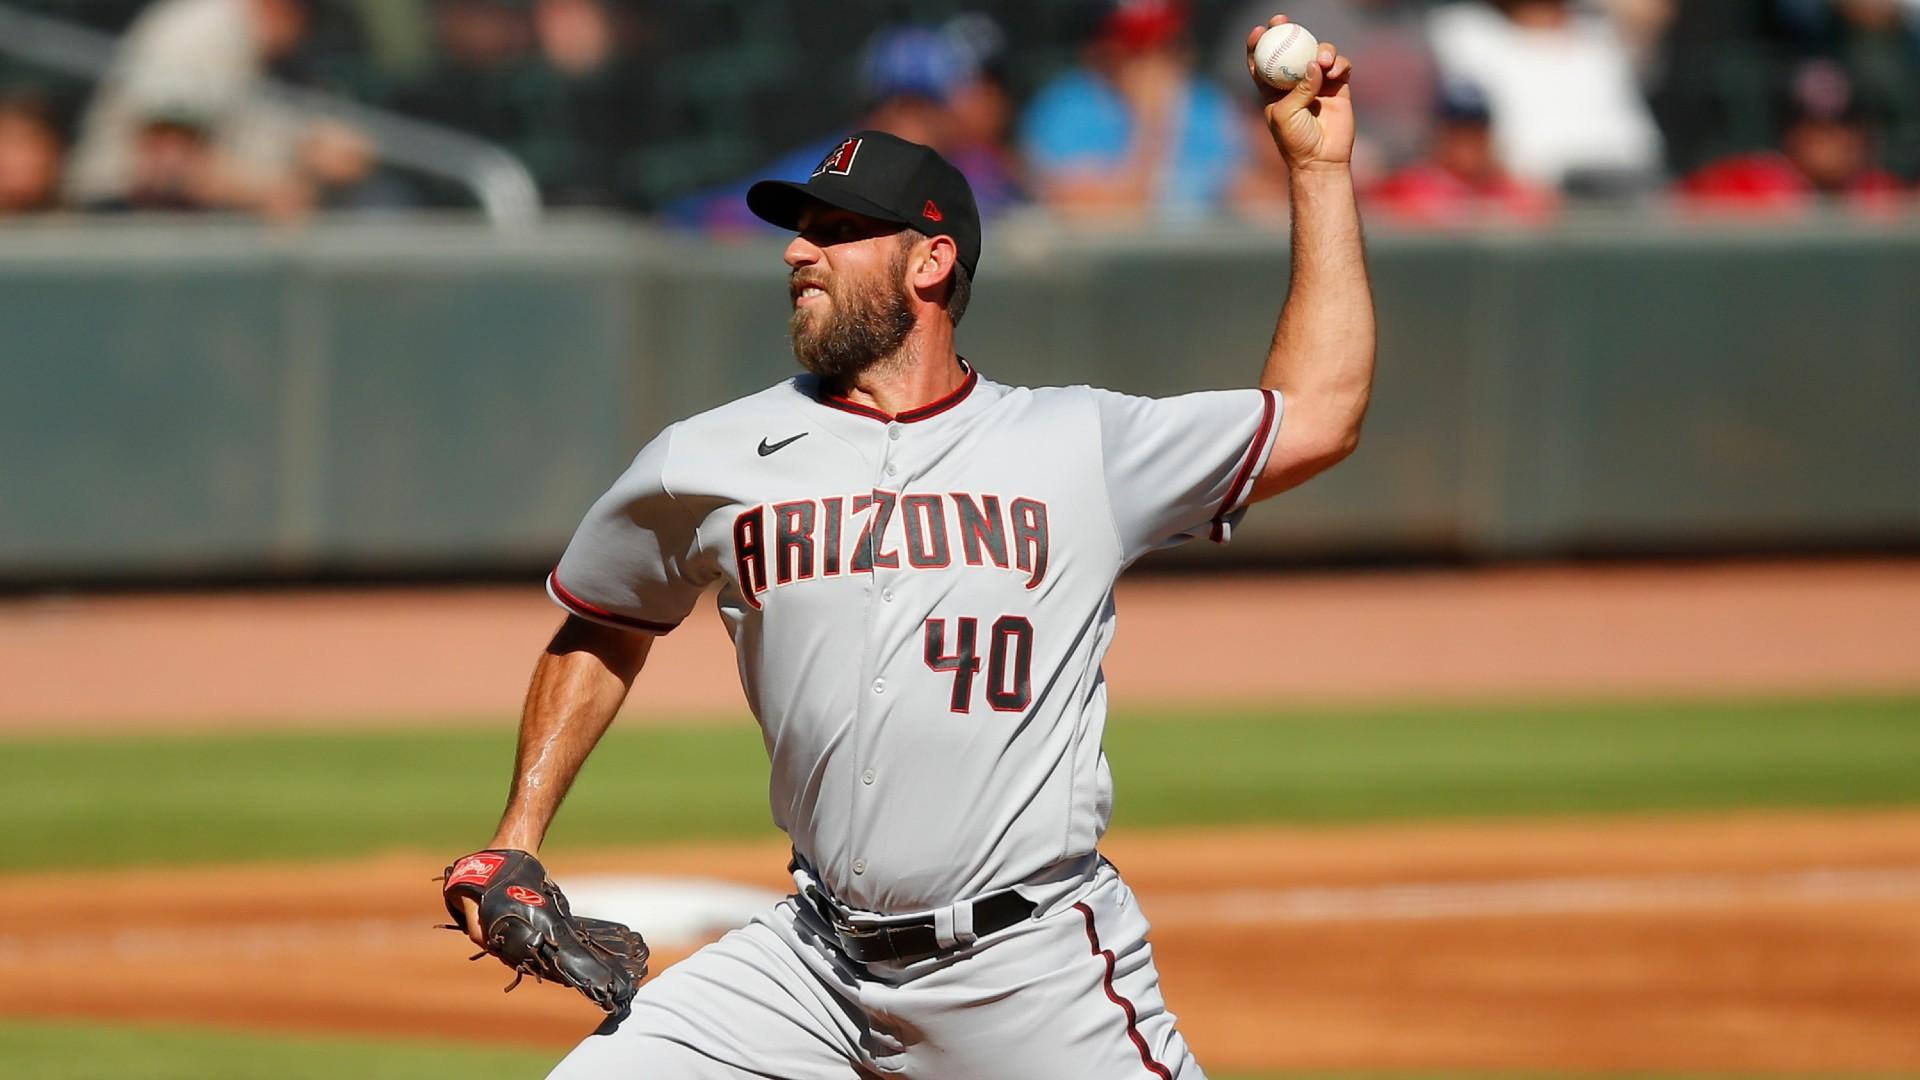 Diamondbacks' Madison Bumgarner no-hits Braves, but doesn't get credit for it